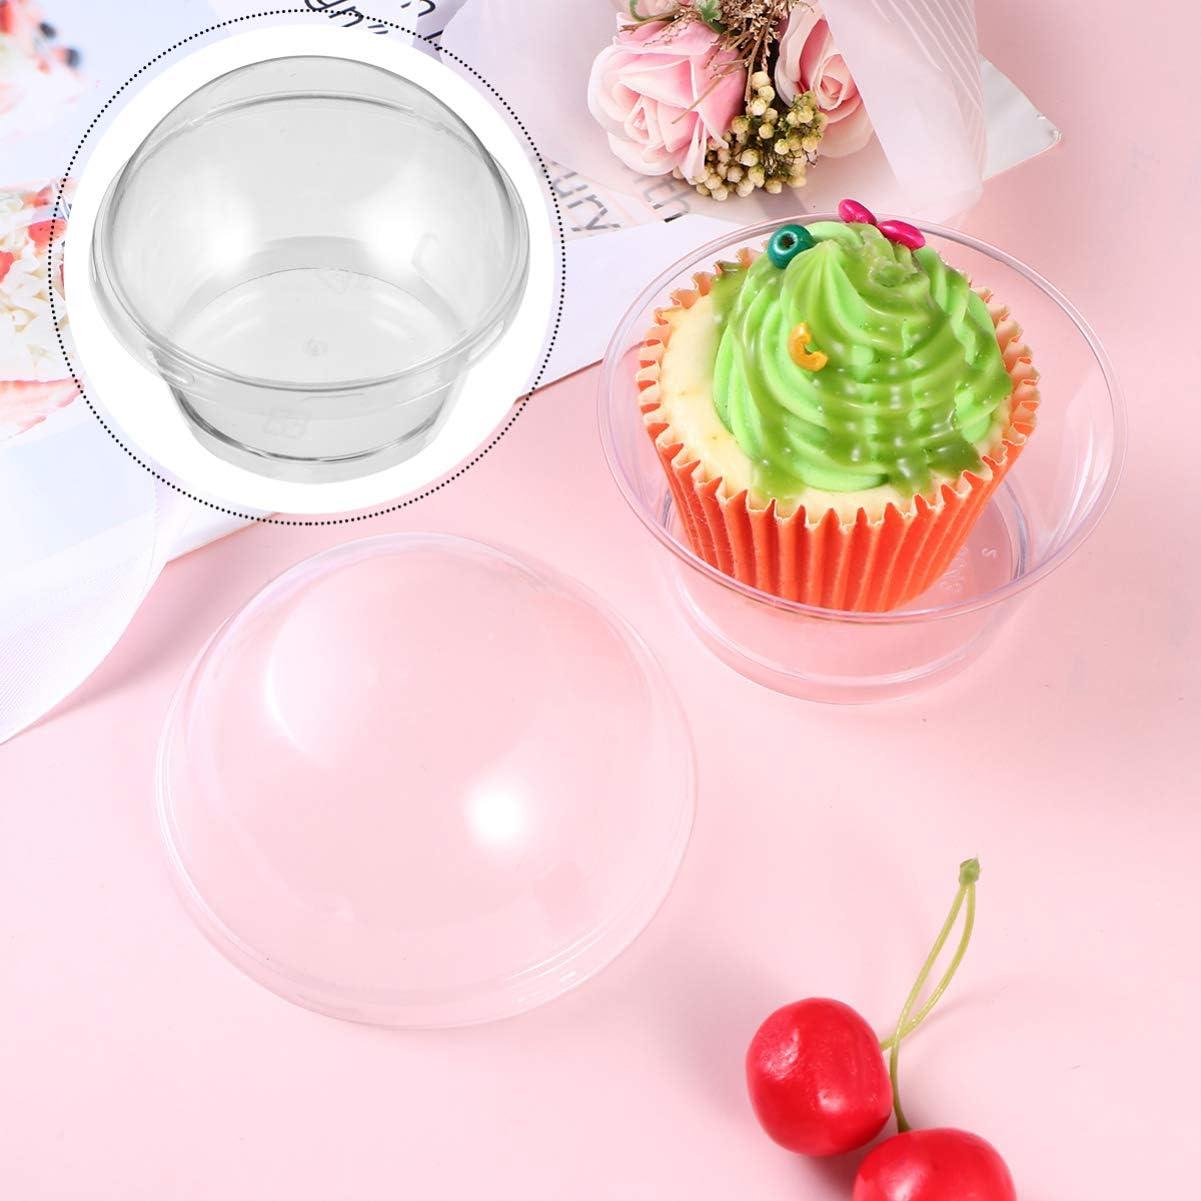 20 unidades Hemoton bodas yogurtera con tapa para llevar para caf/é fiestas cumplea/ños pud/ín Vasos desechables de pl/ástico transparente para postres transparente tartas